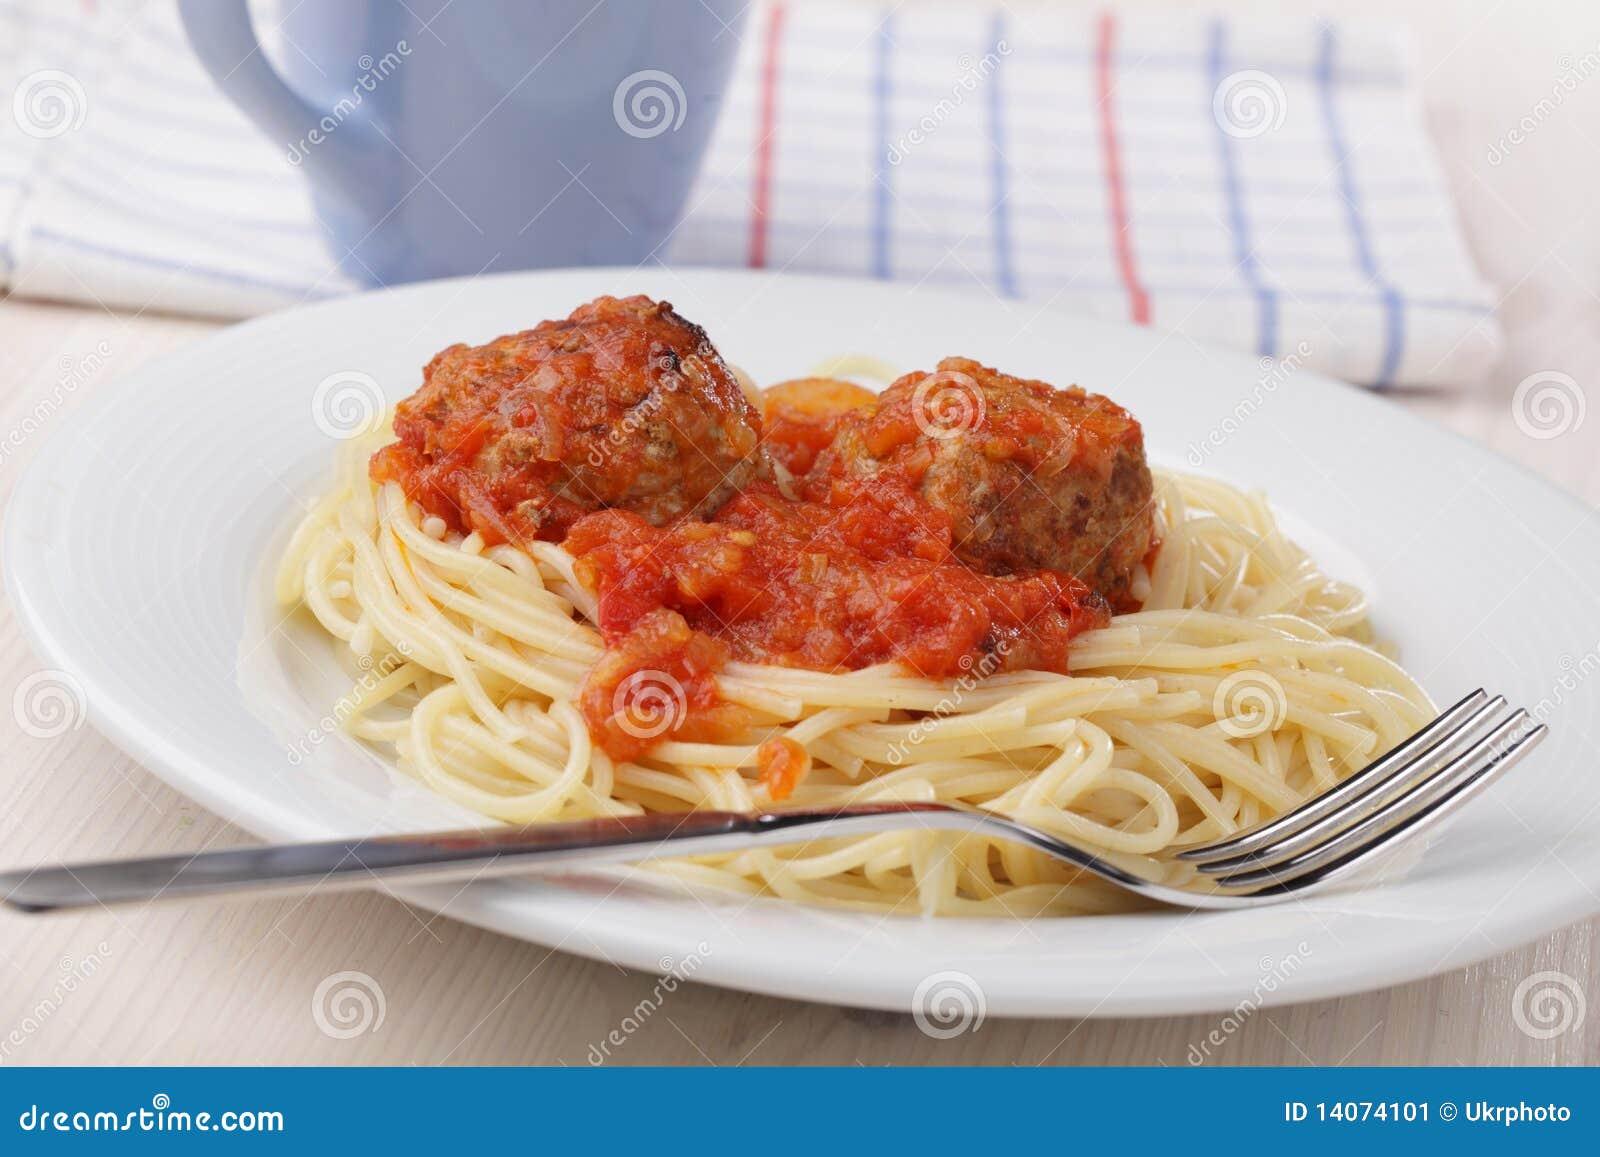 Boulettes de viande et spaghetti